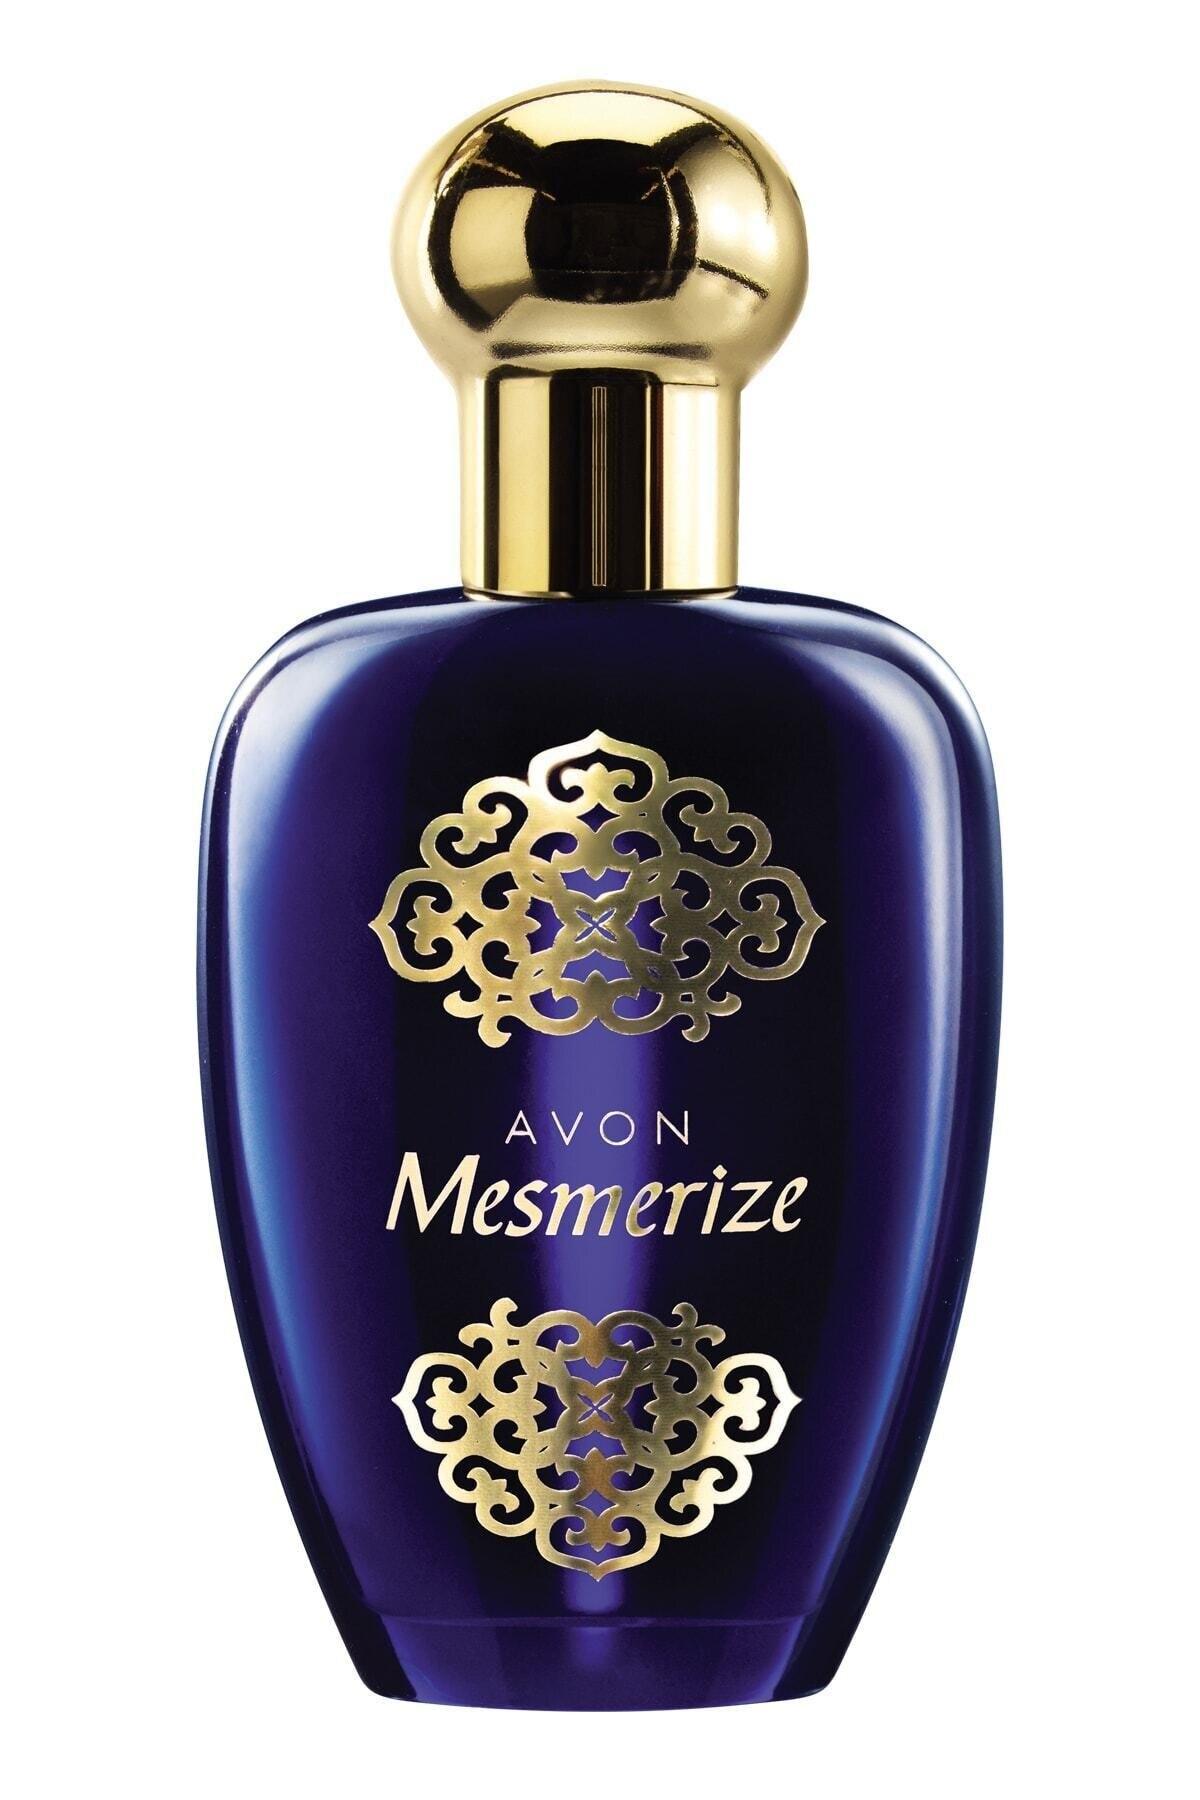 Avon Original Brand Belly Mesmerize Women Perfume Lasting Impressive Pleasant Sexi Gift New Season